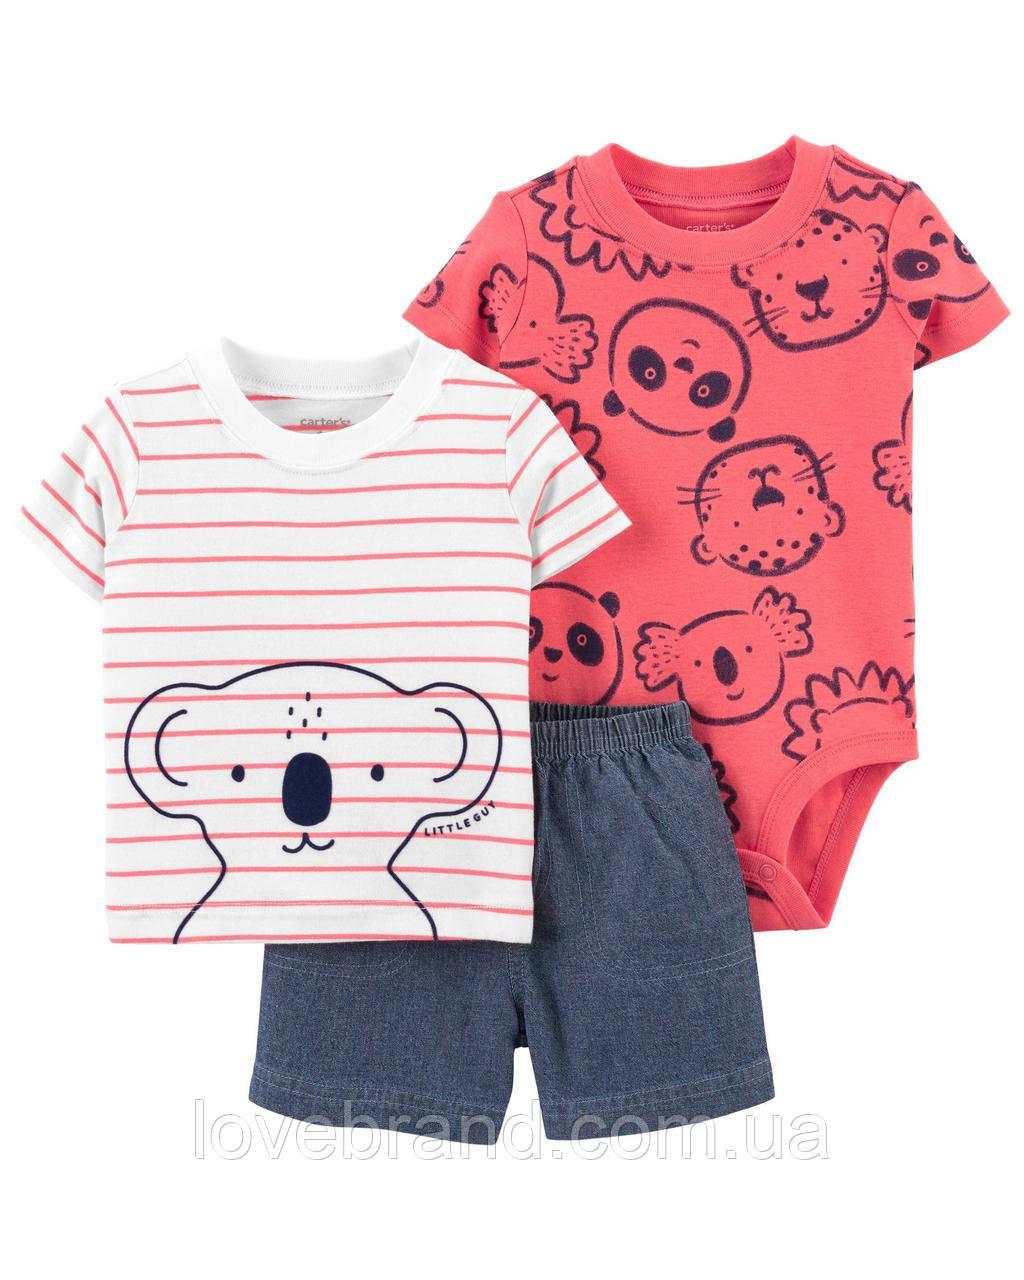 "Костюм для малыша Carters ""Коала"" шорты, футболка, бодик"